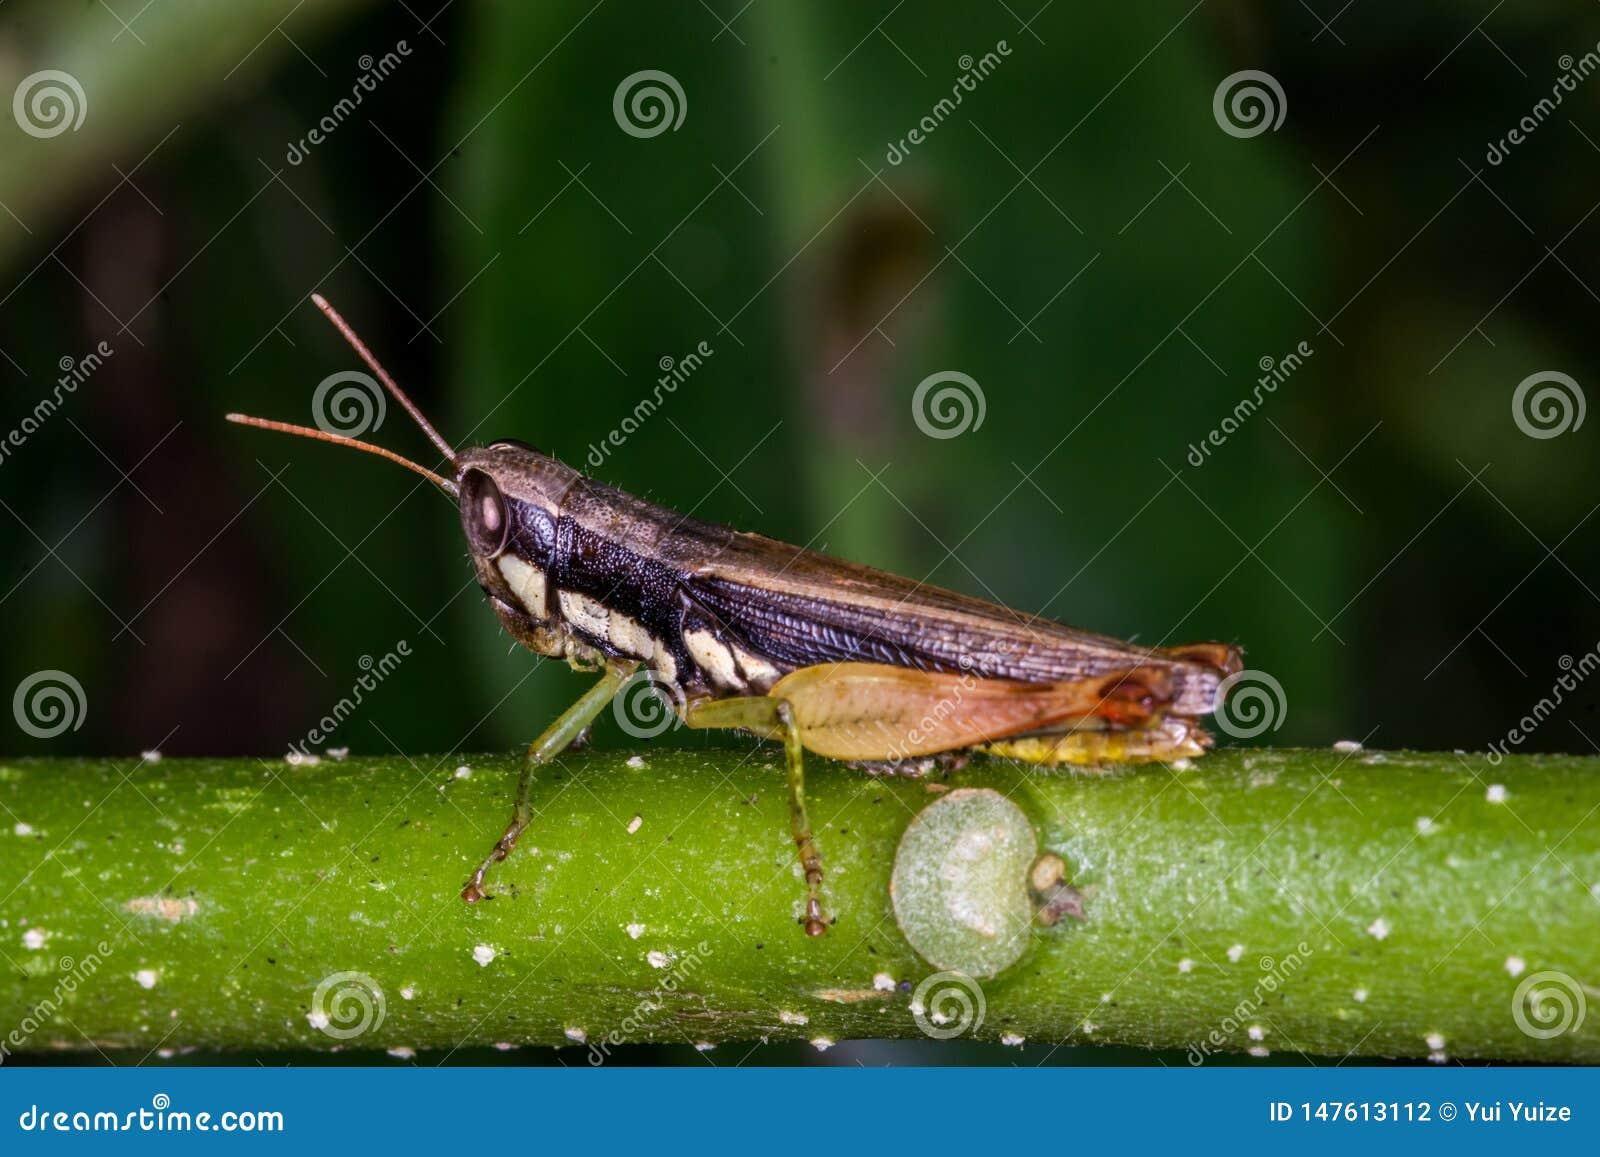 Gräshoppa på grönt gräs